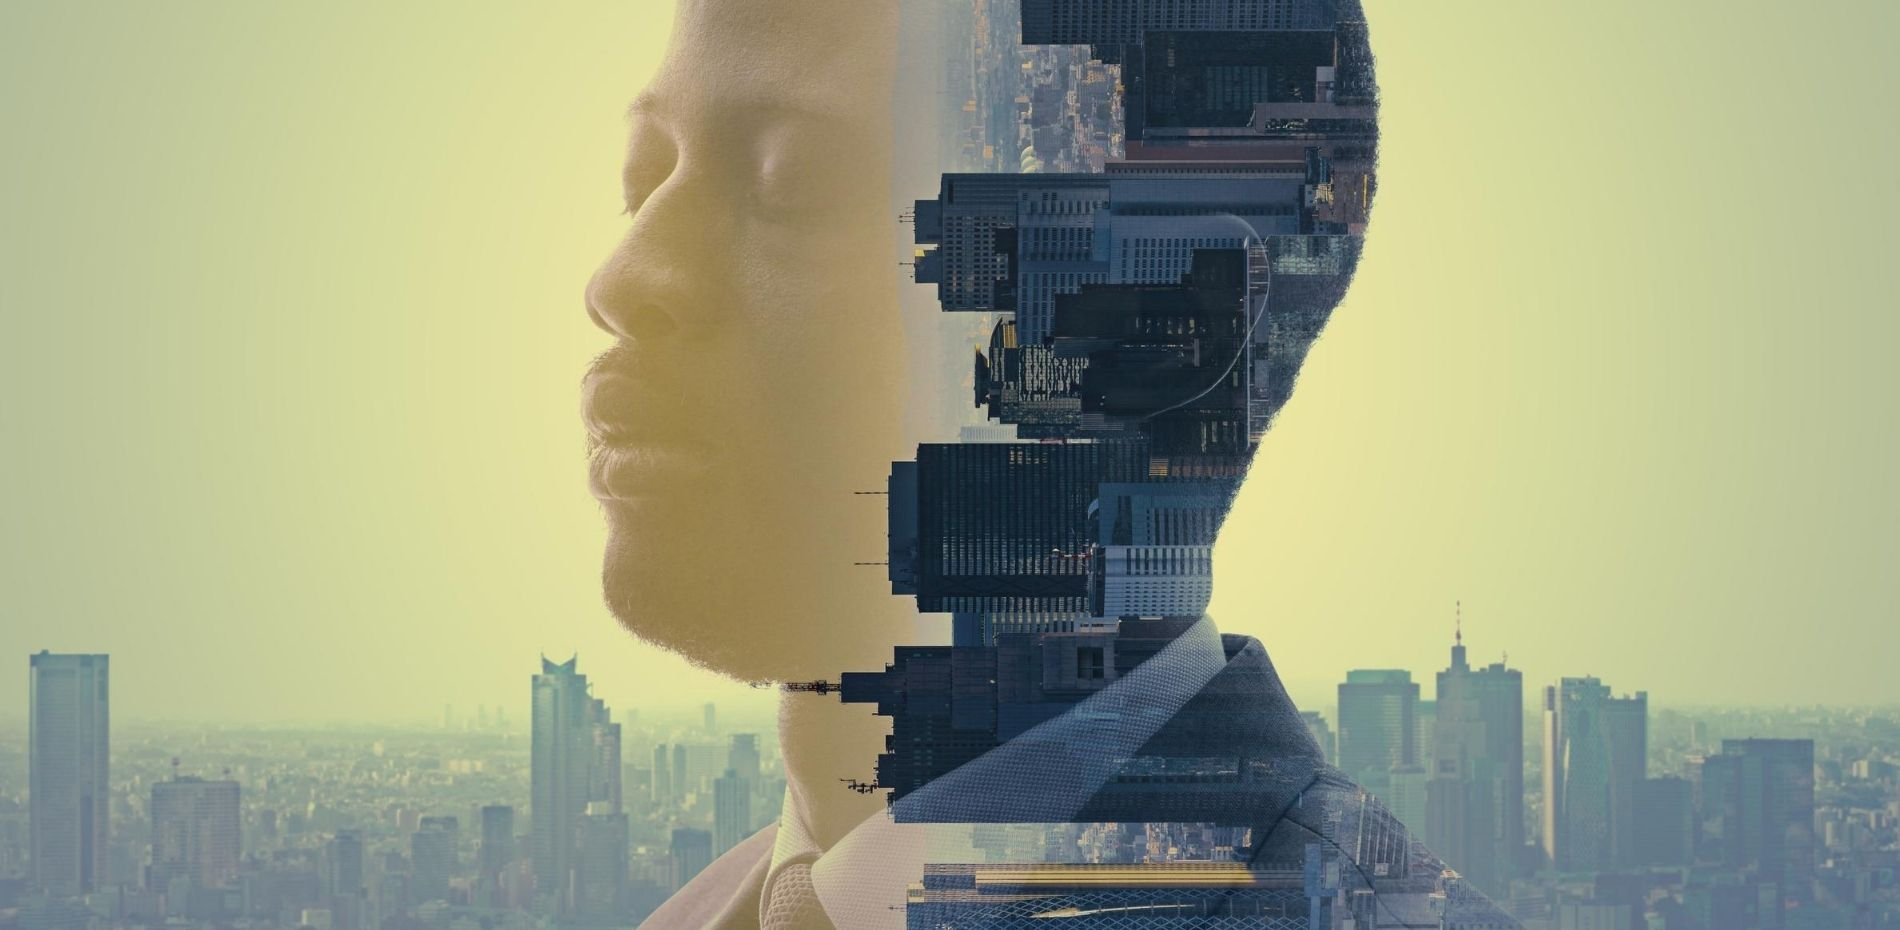 Mindful leader practicing meditation overlooking city